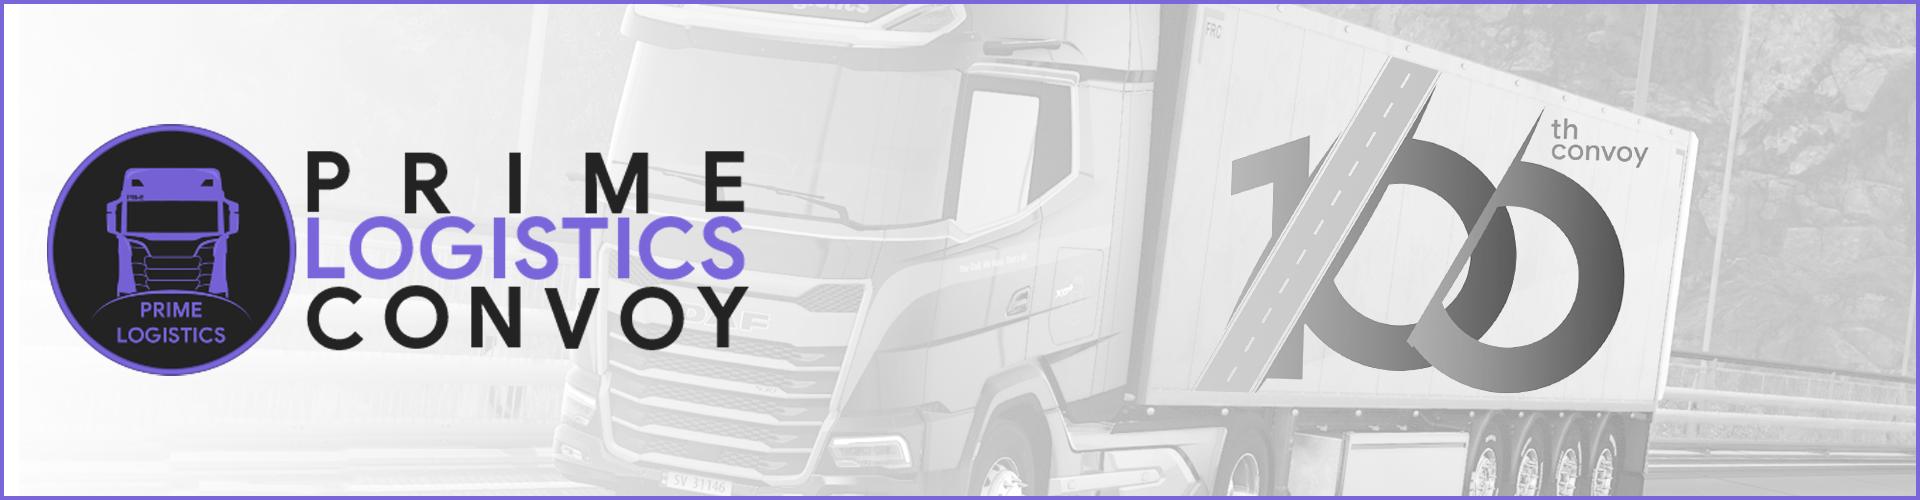 🟣 Prime Logistics Convoy #100 - 100th ETS2 Special!